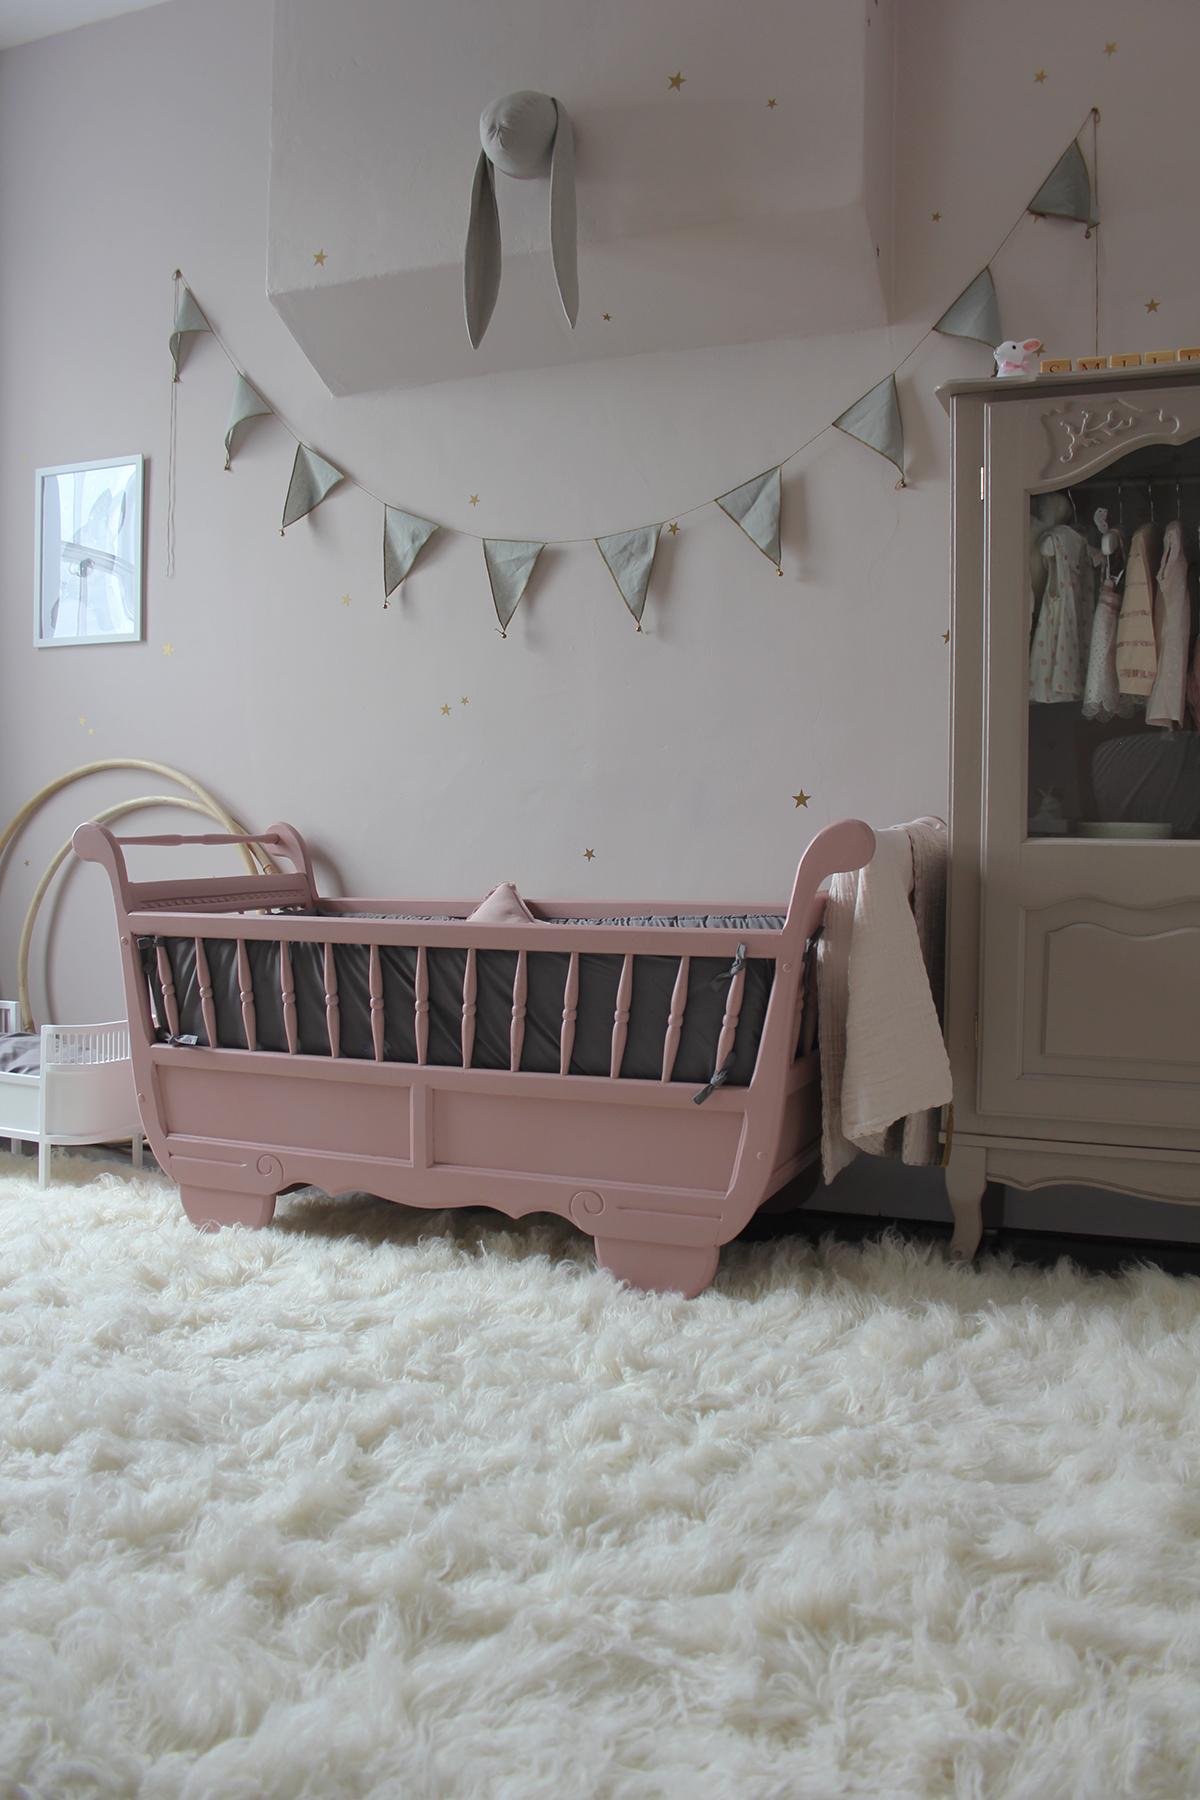 Preciously Me blog : One Room Challenge - Nursery Reveal